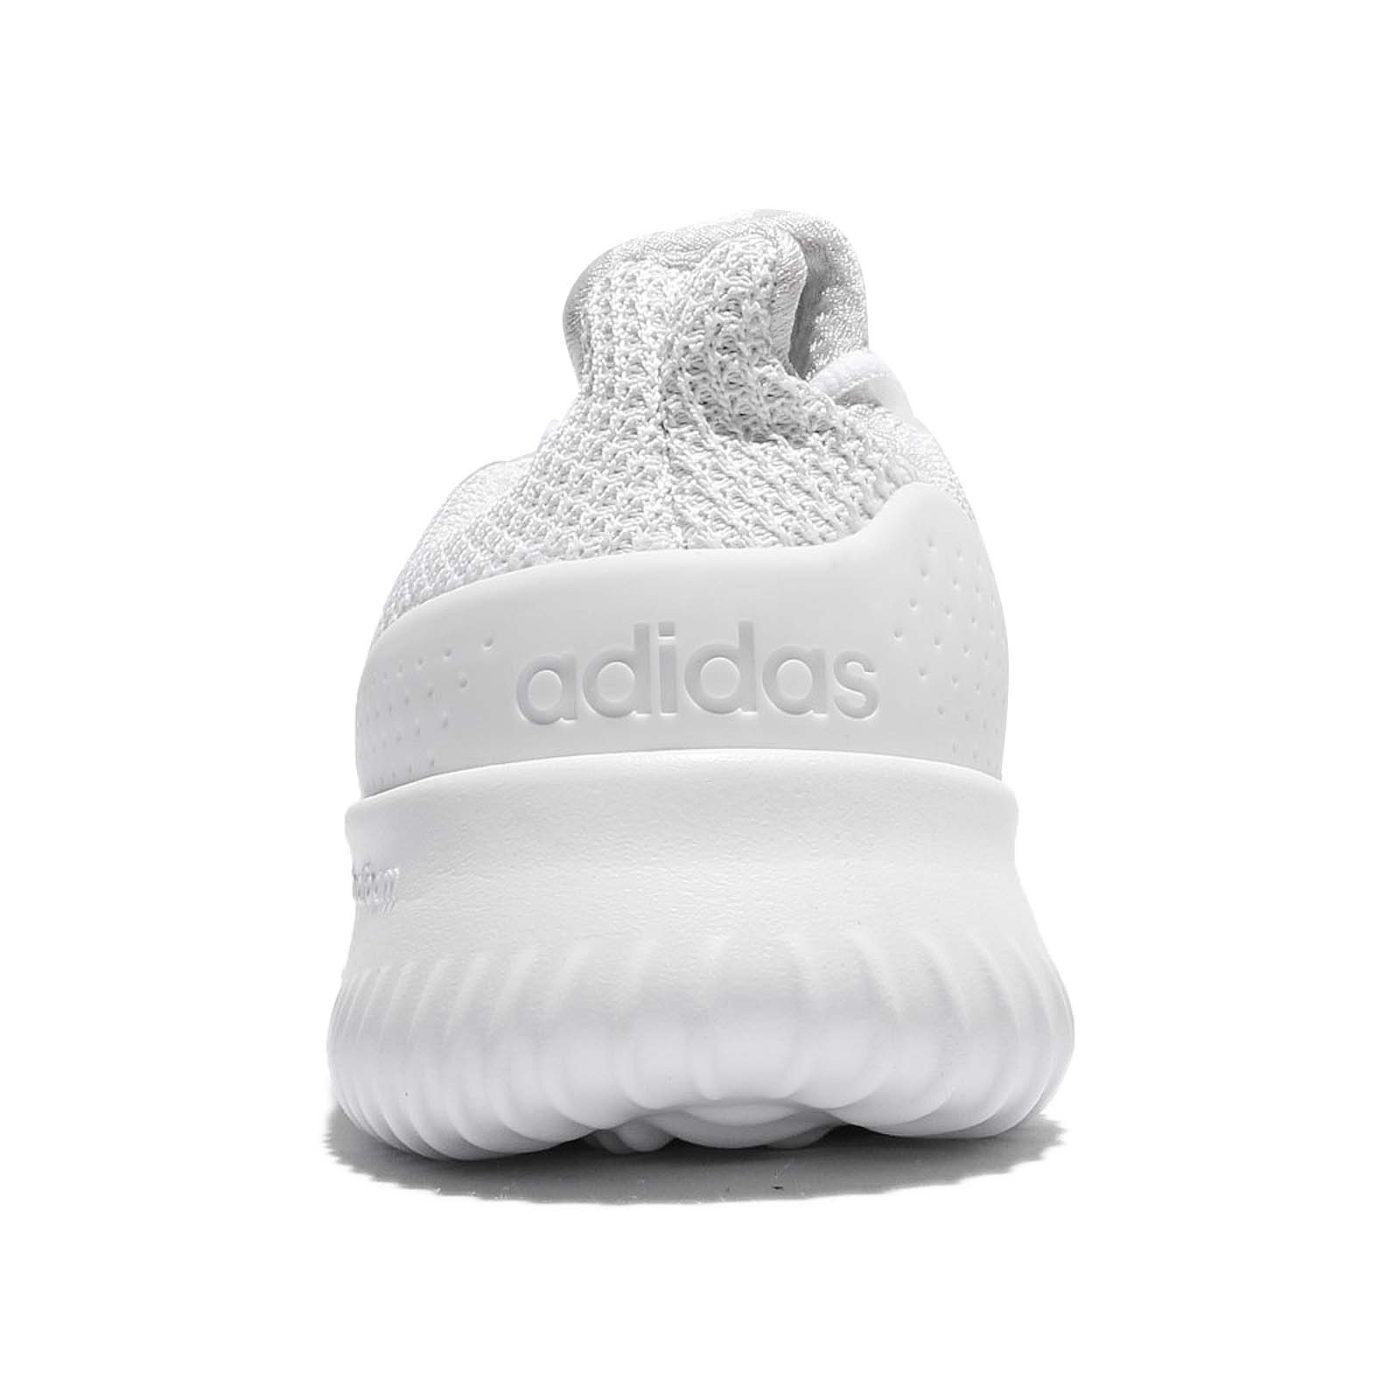 adidas 慢跑鞋 Cloudfoam Ultimate 女鞋